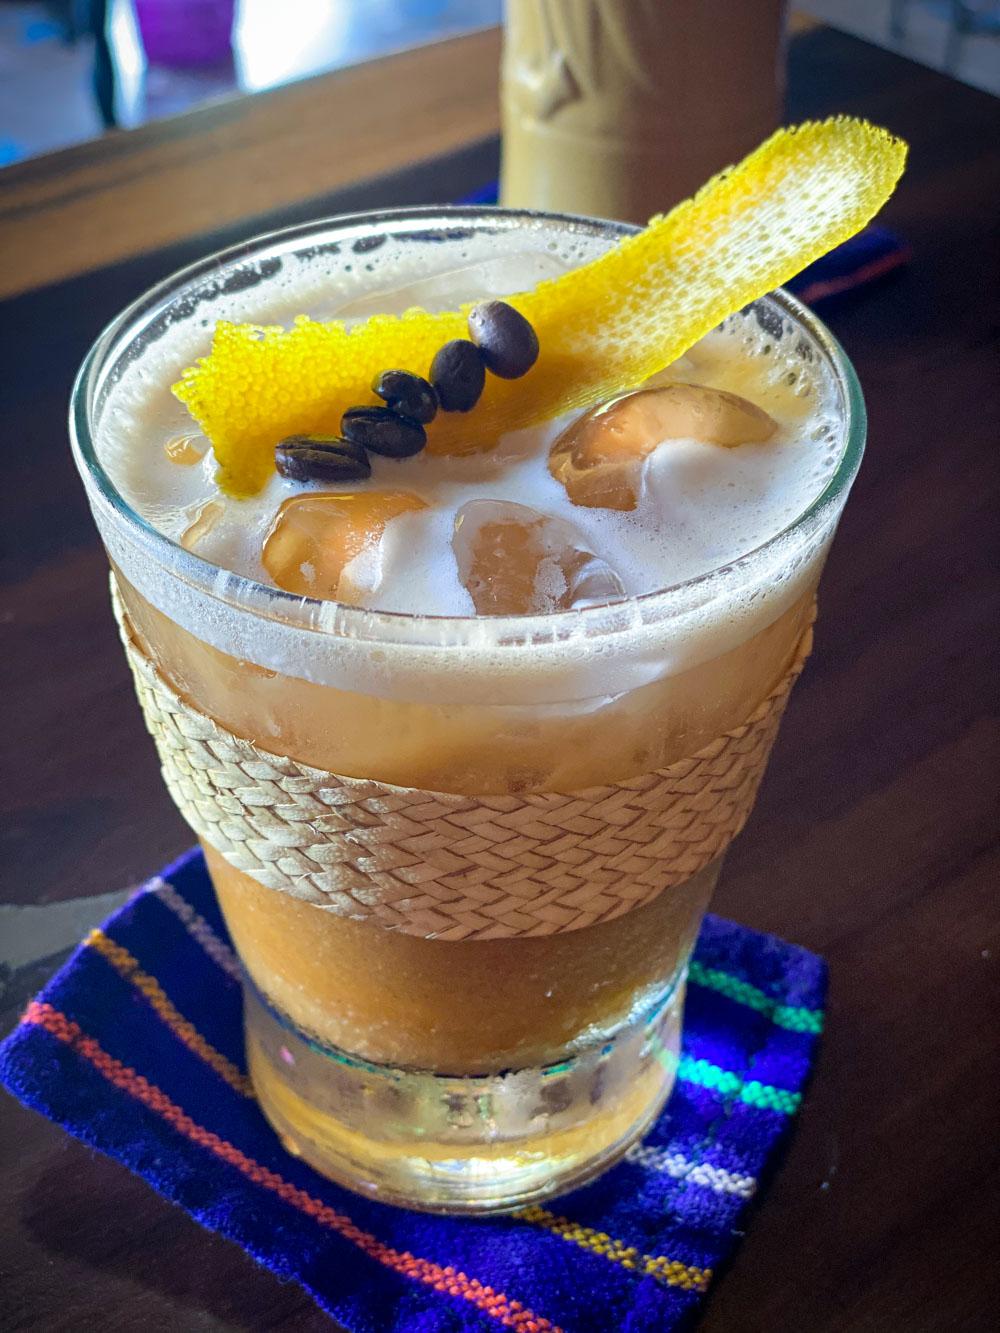 A tiki cocktail with coffee beans at Tiny Tiki Hut